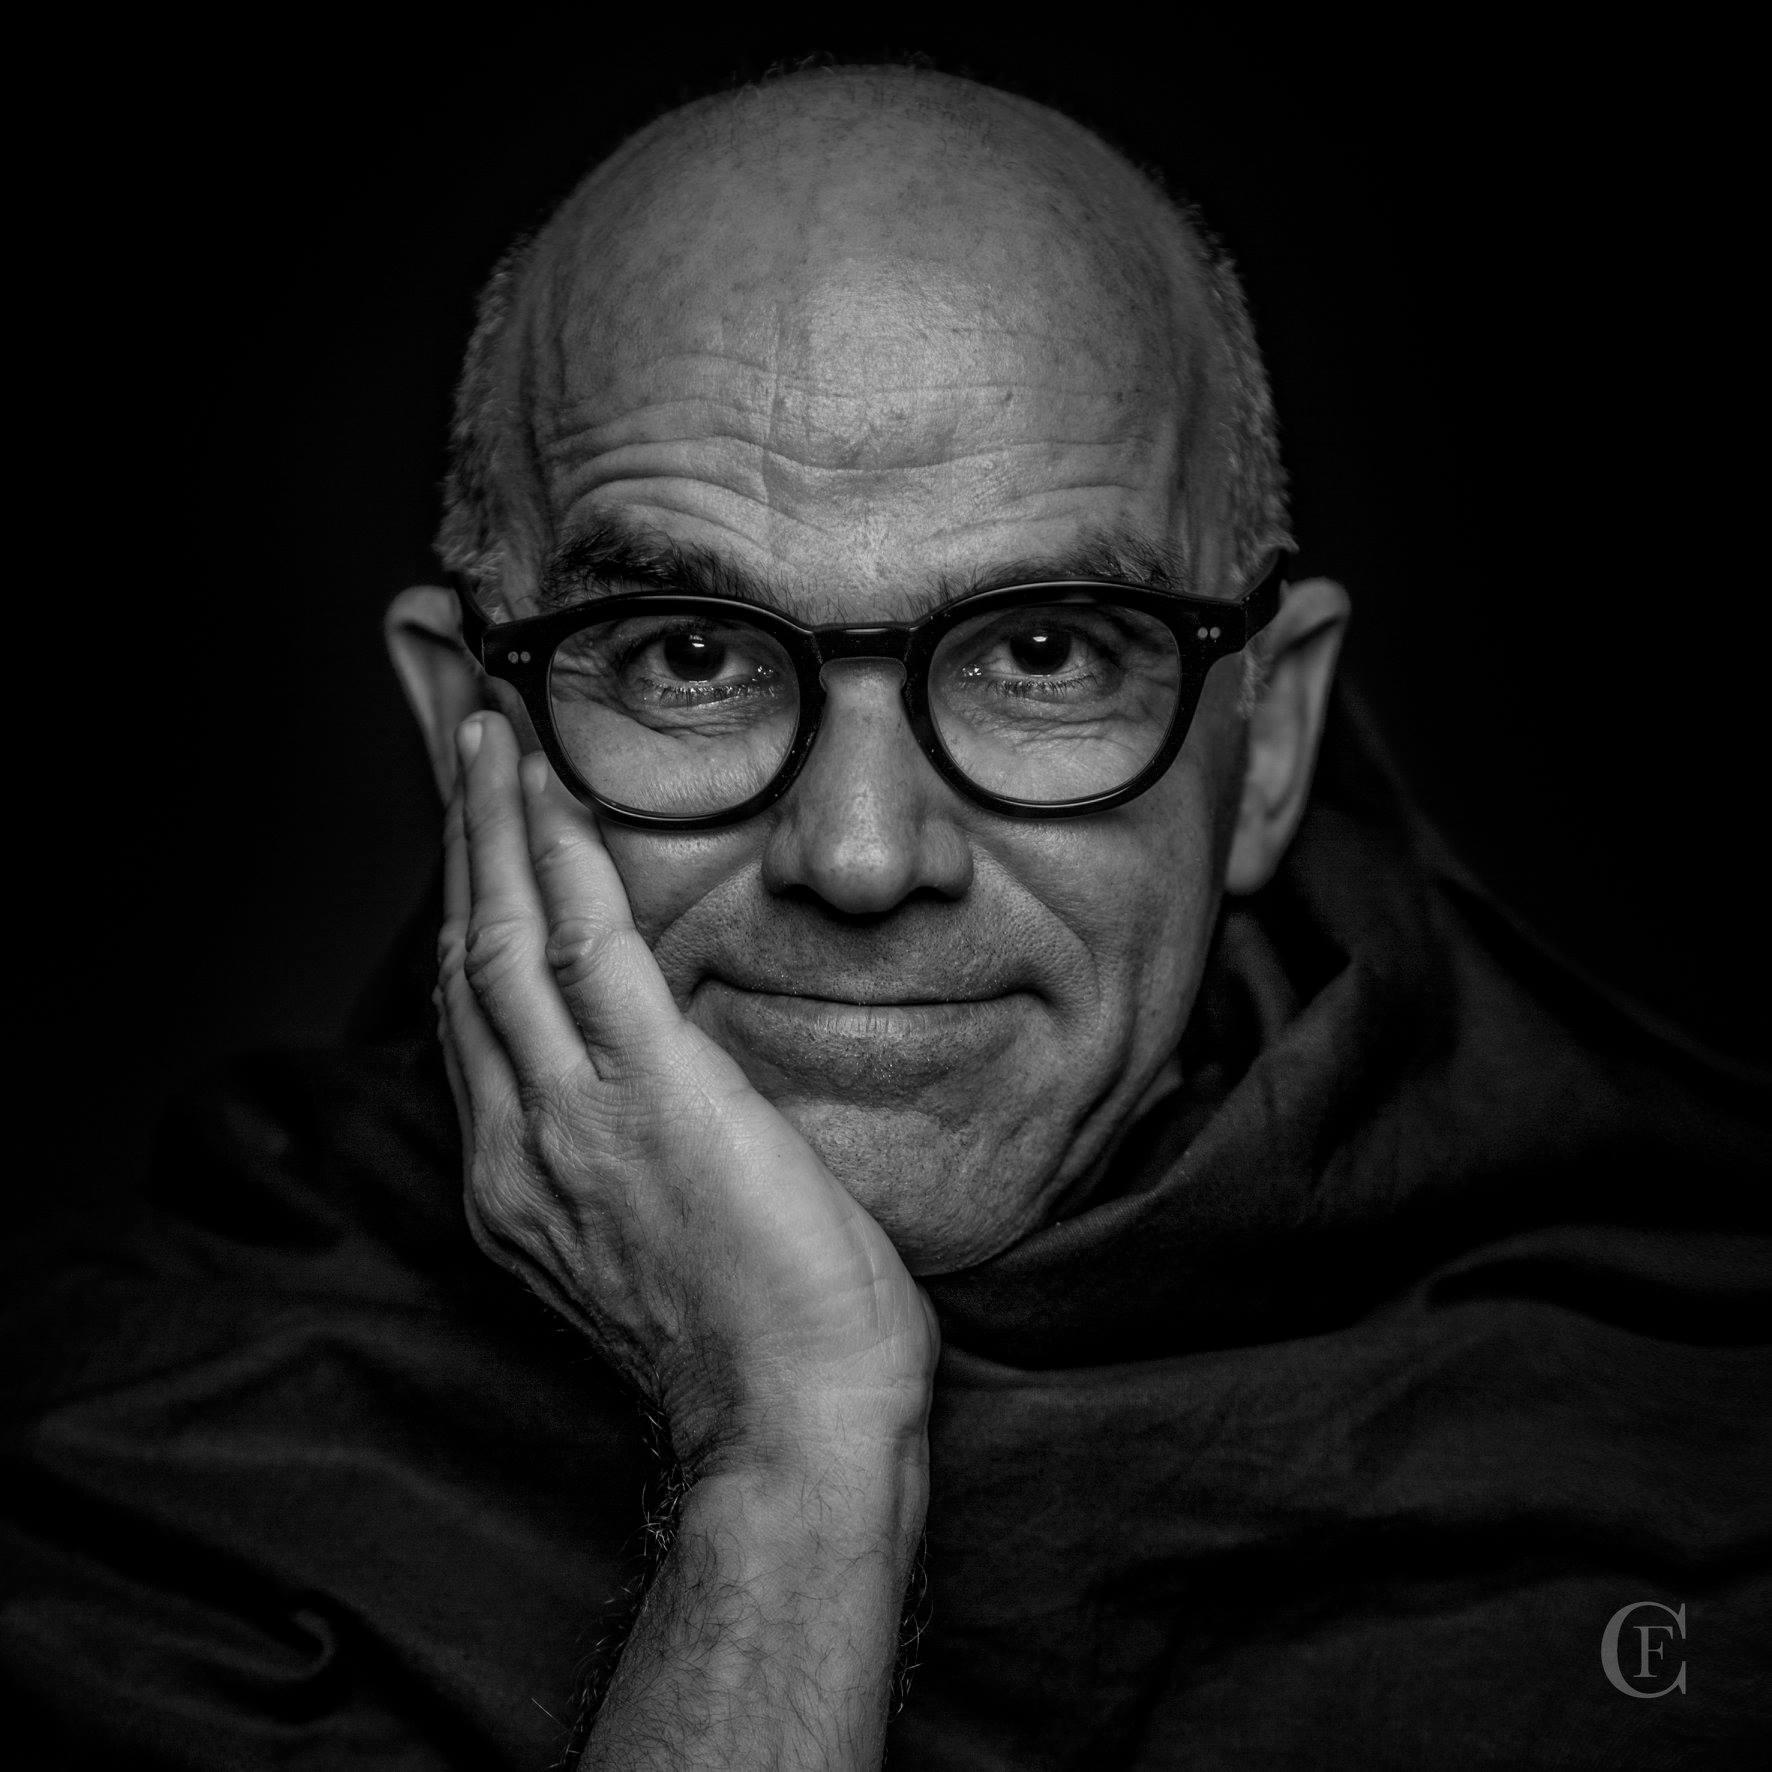 gabriel martinez photographe